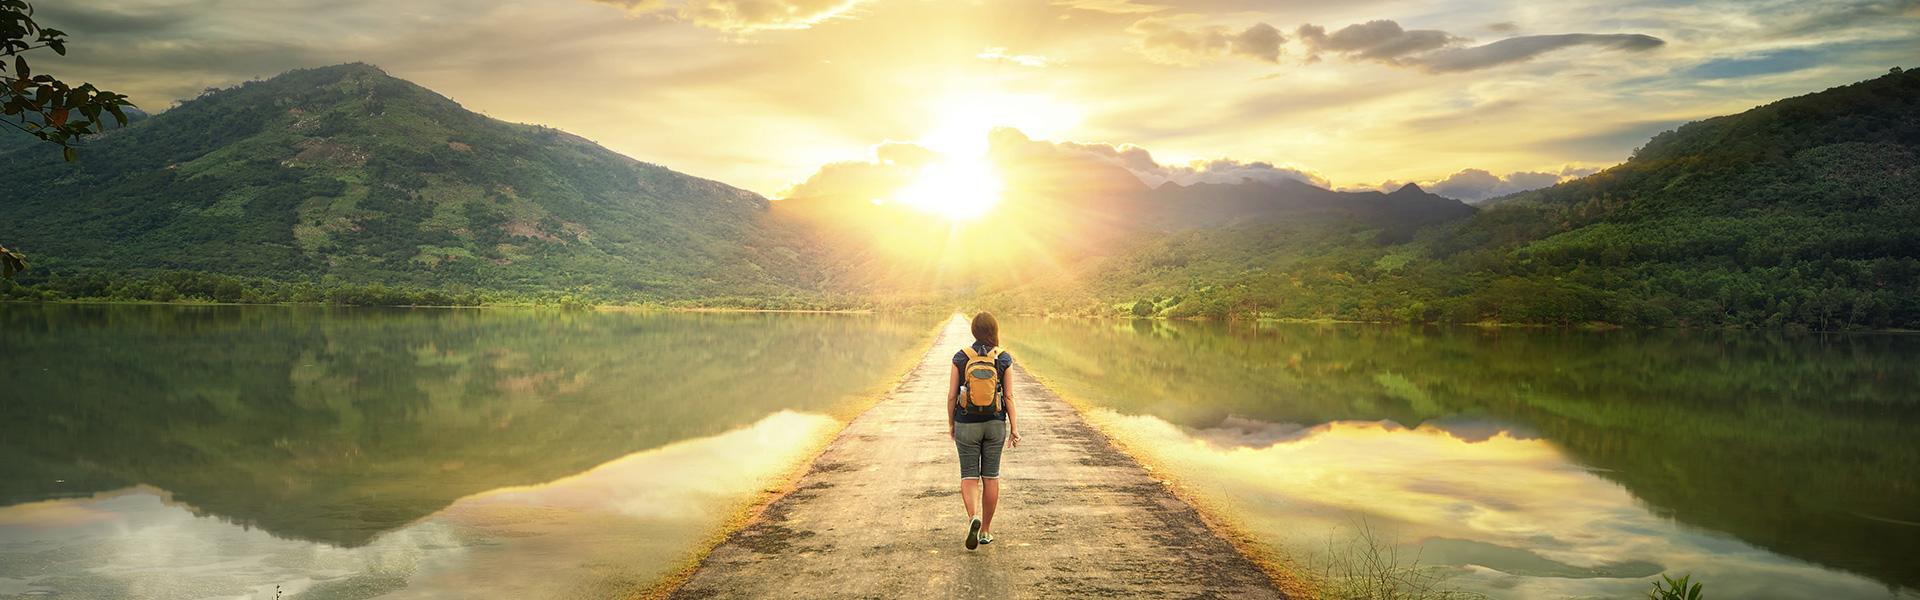 Traveller walking over a beautiful lake